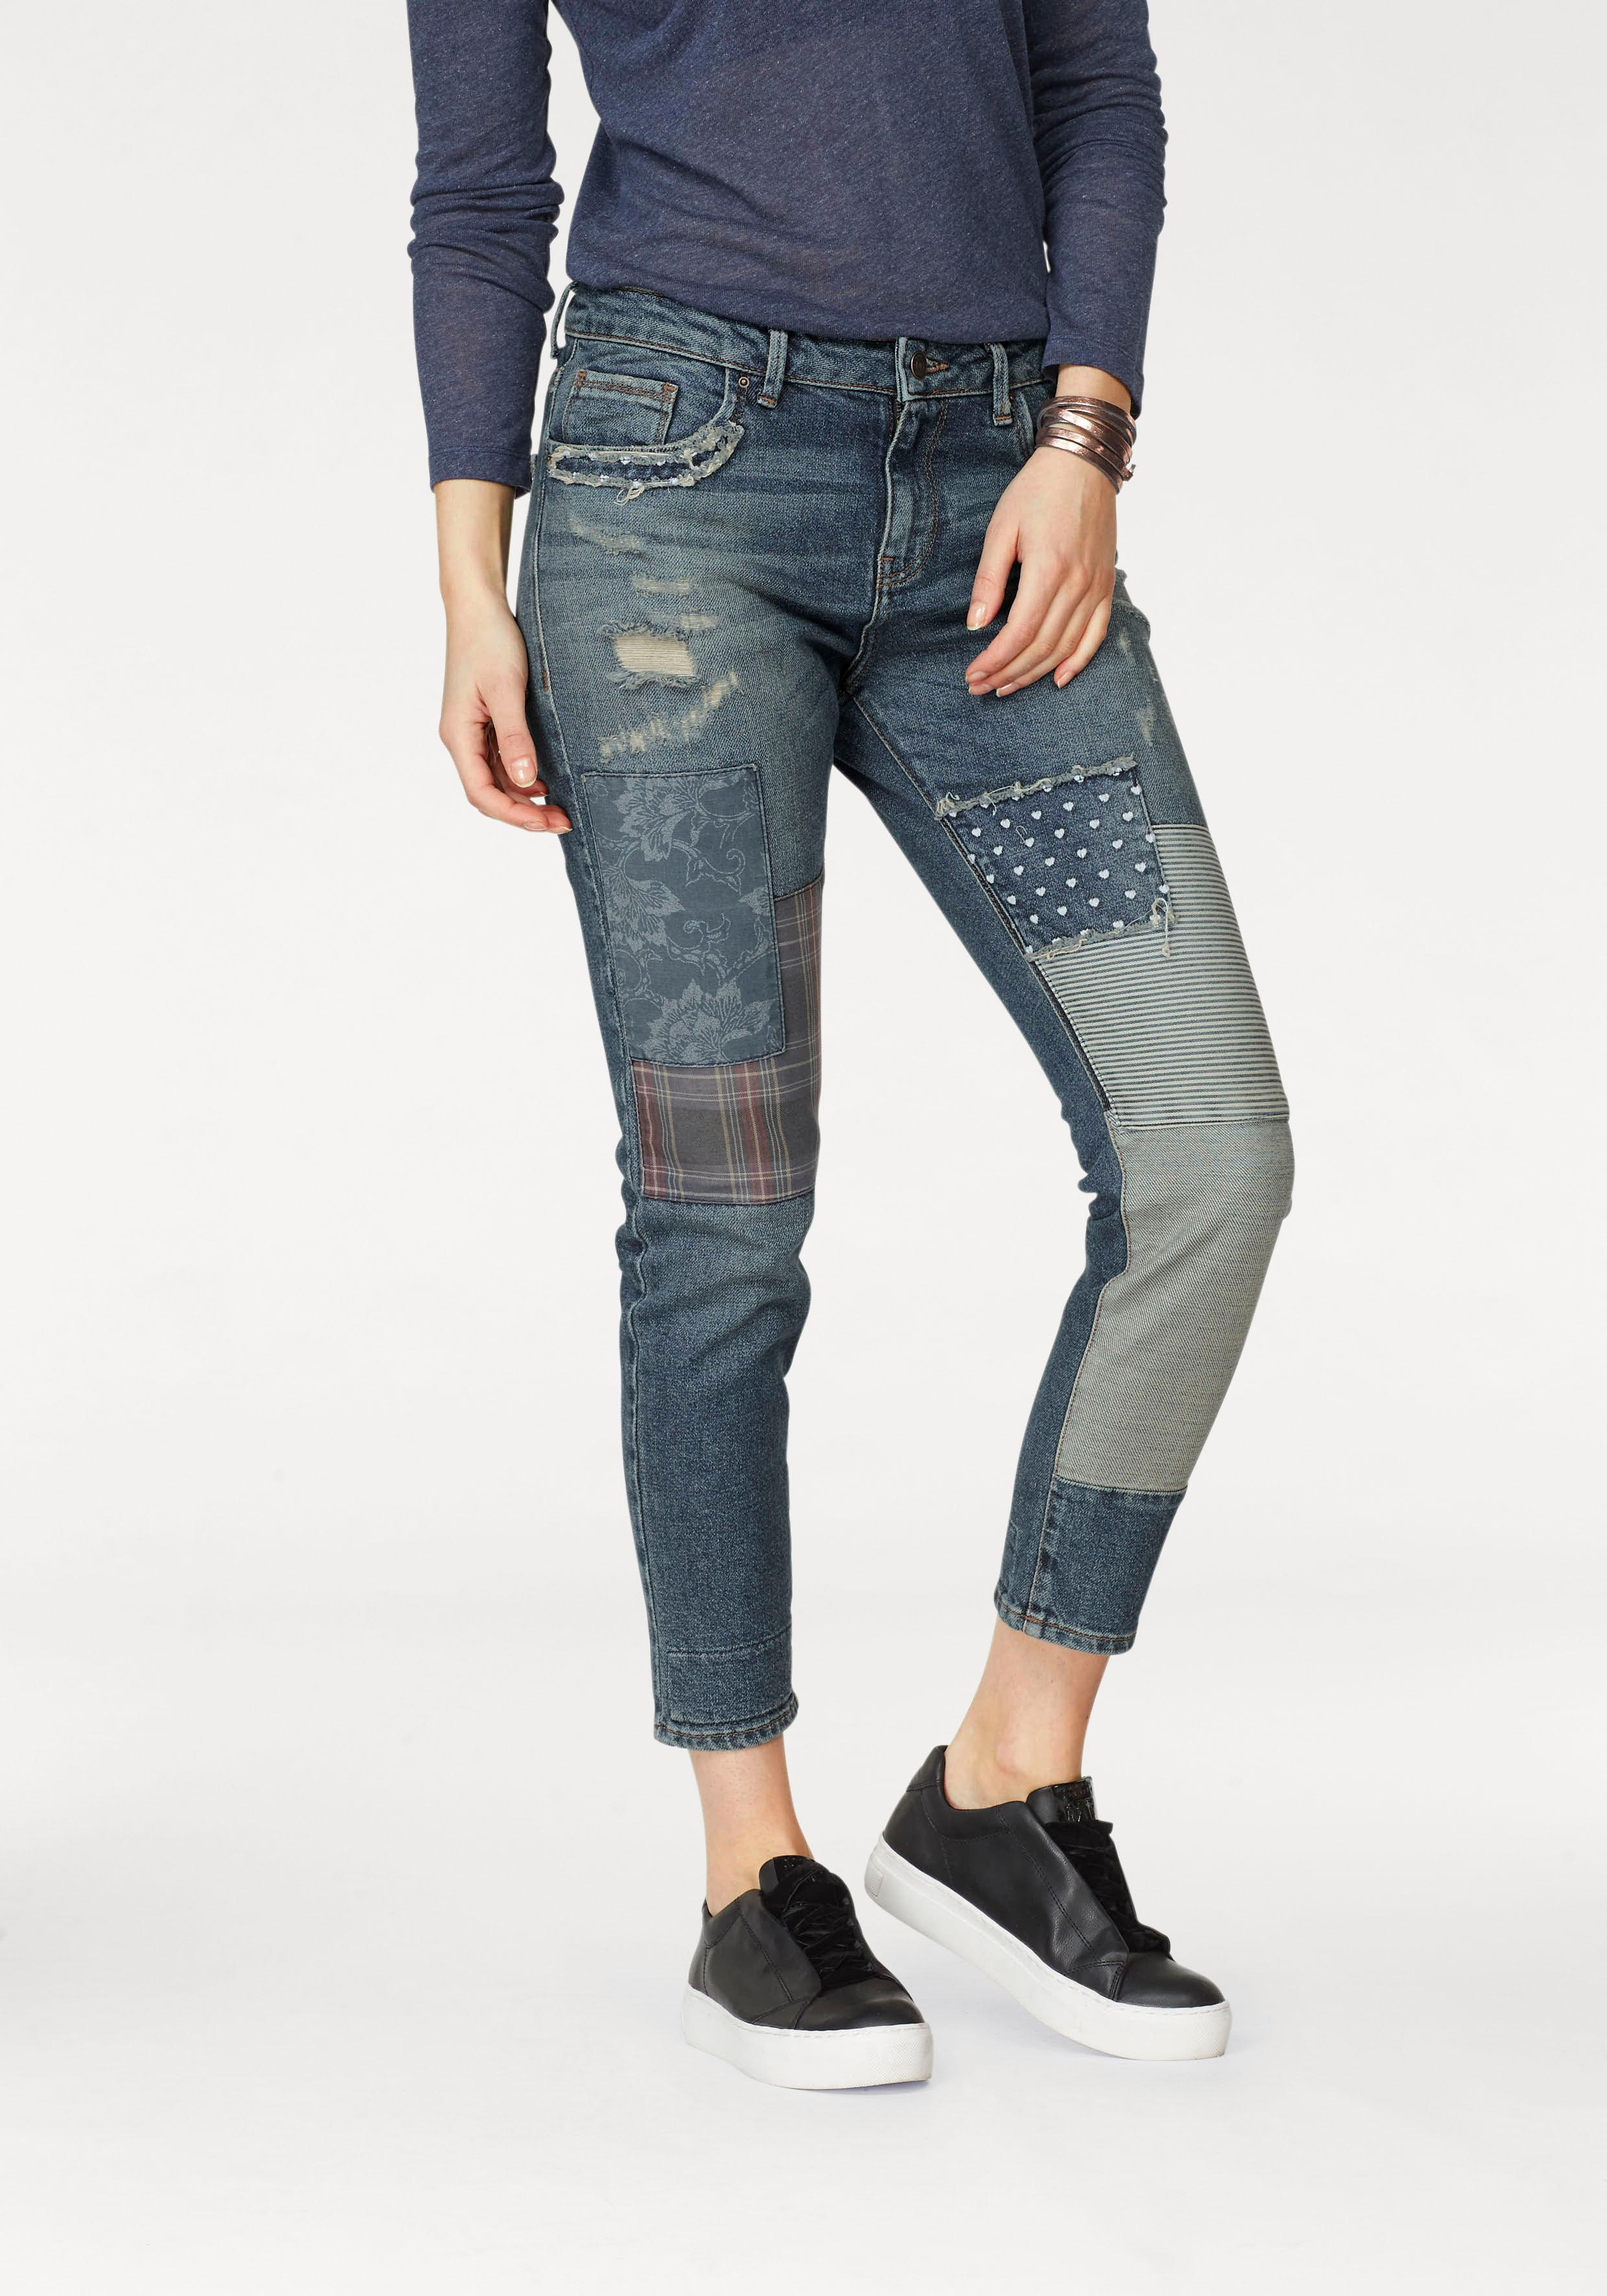 LTB Boyfriend-Jeans WICCA   Bekleidung > Jeans > Boyfriend-Jeans   Blau   Ltb